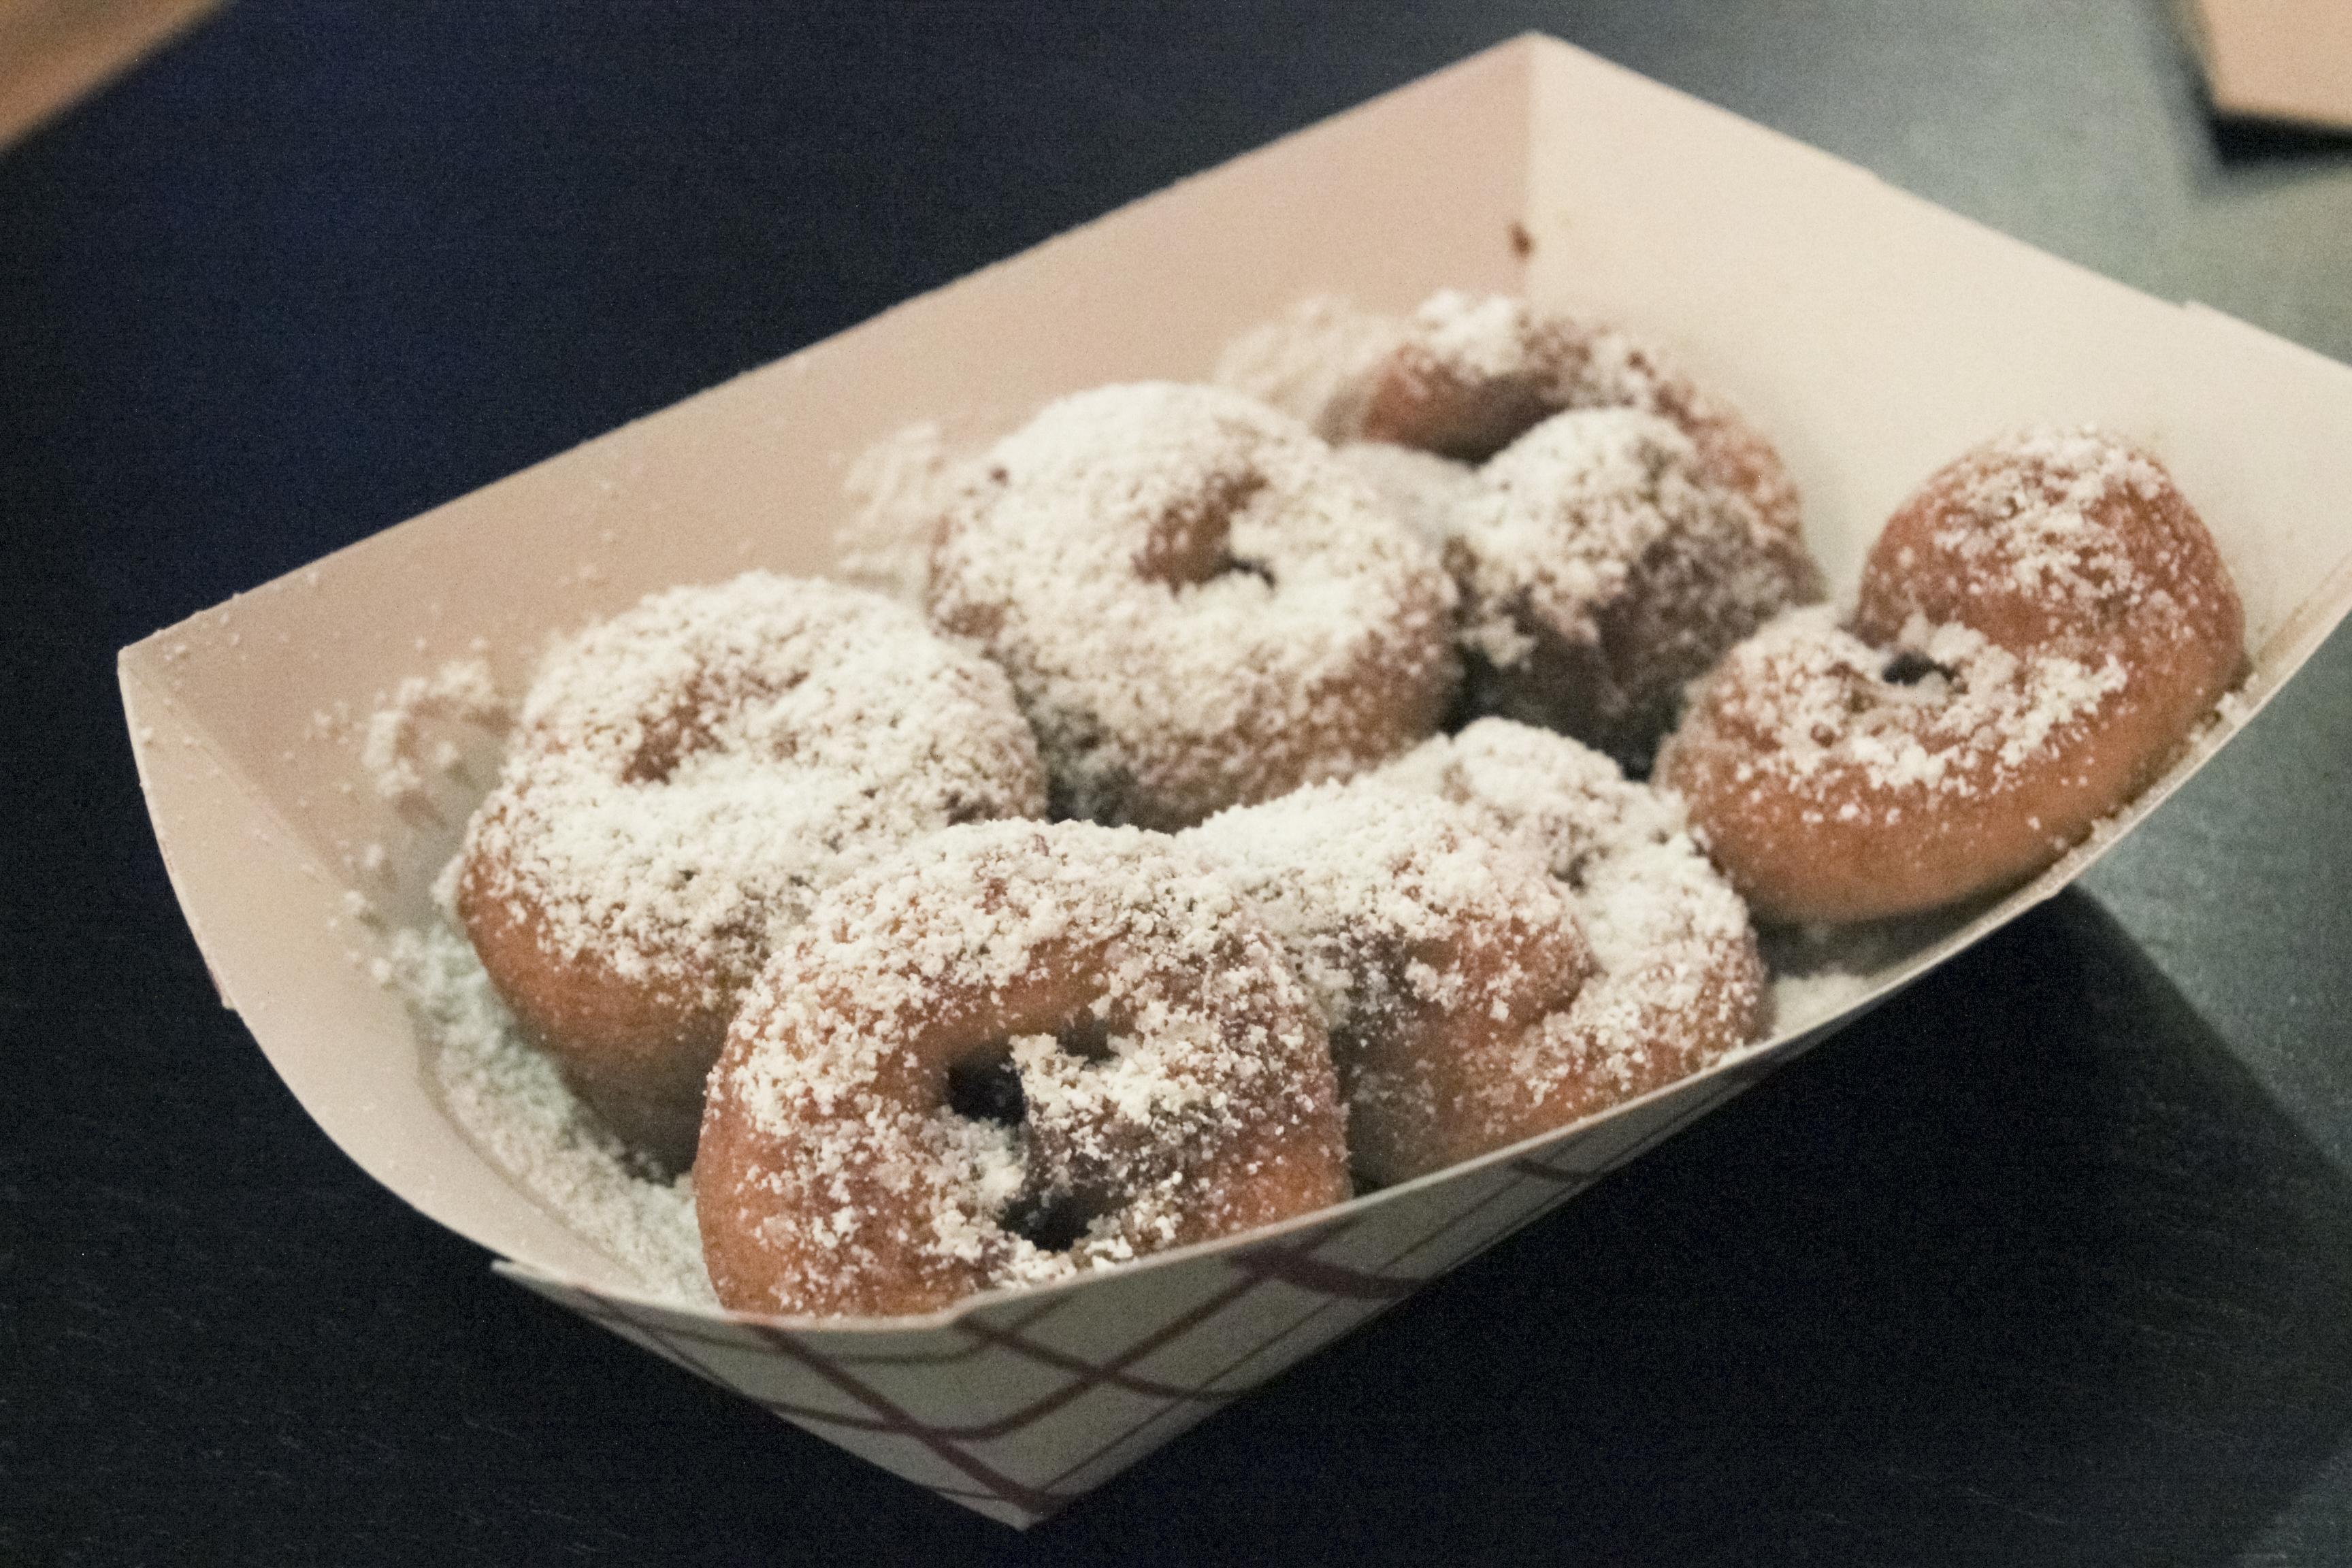 Fried Mini Doughnuts